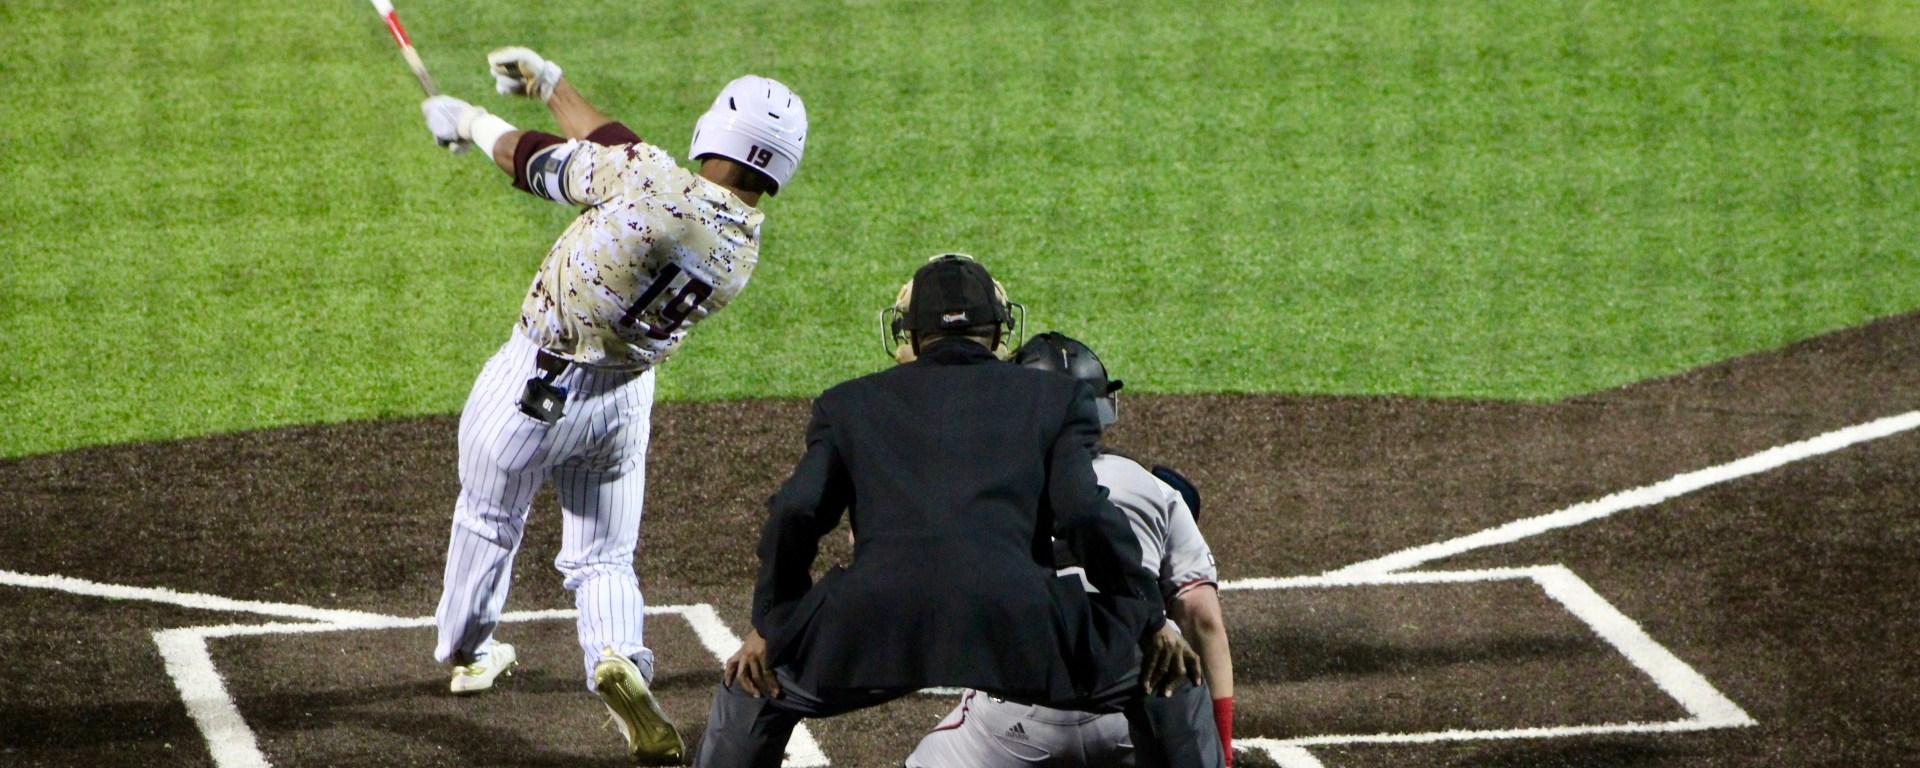 Jaylen Hubbard swings at a pitch